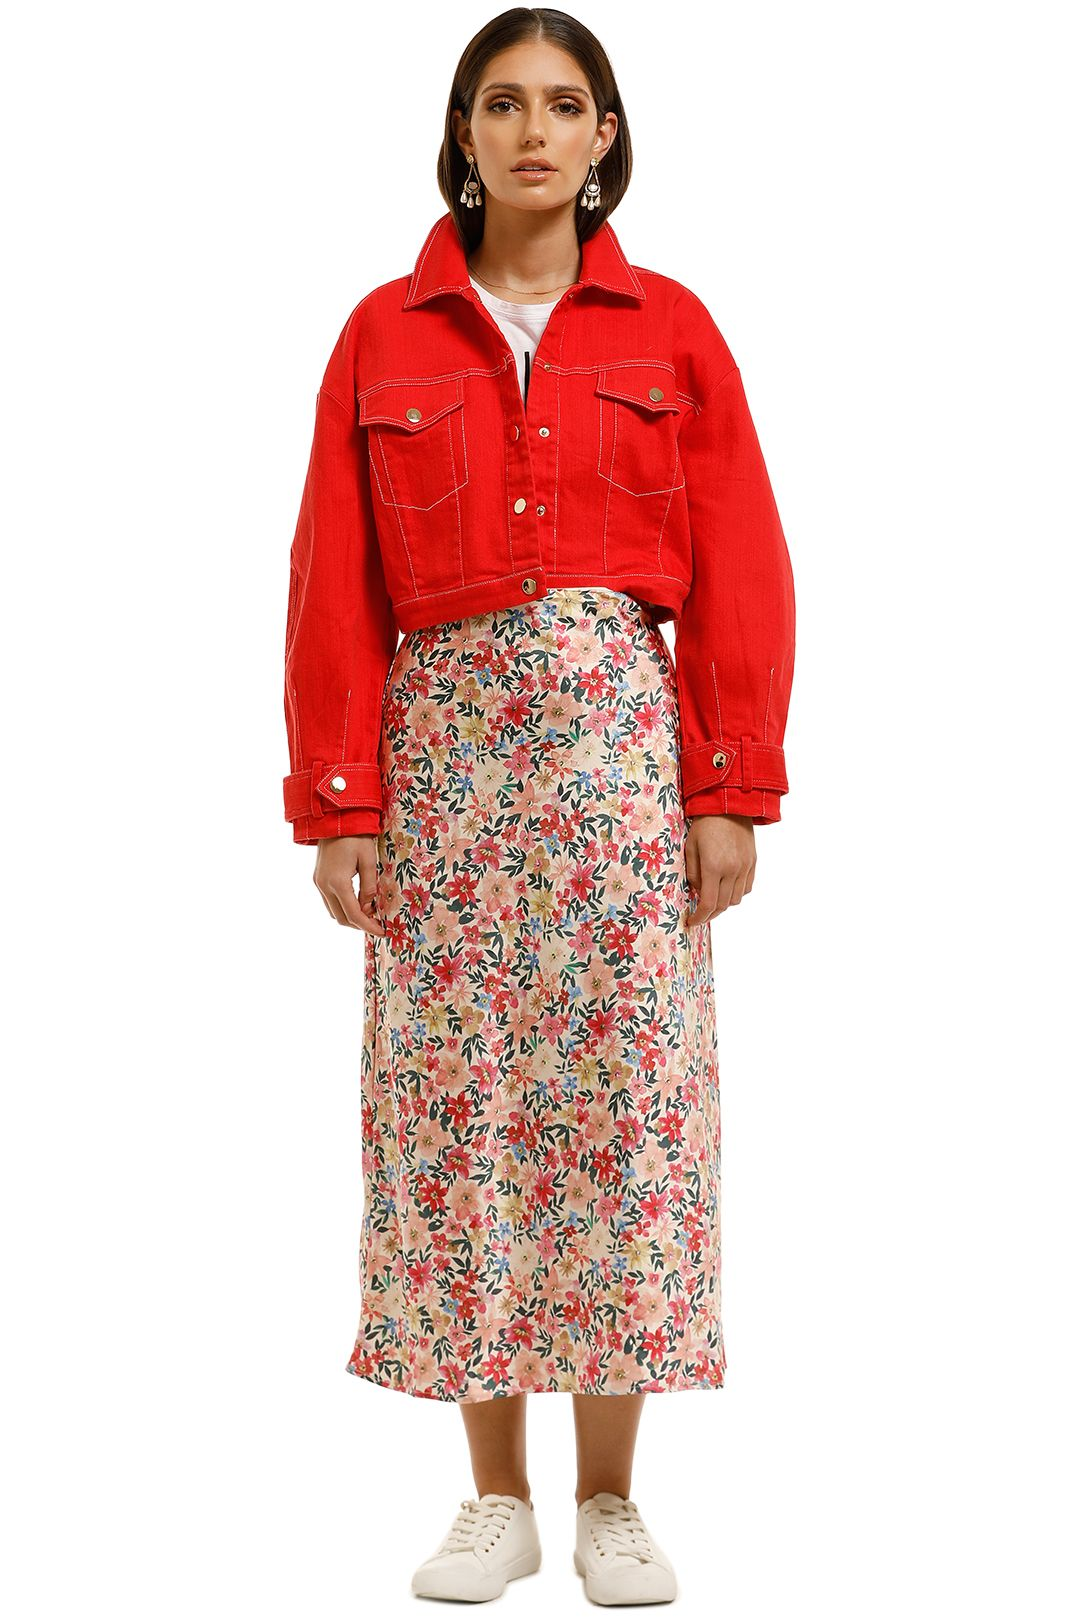 Elliatt-Leilani-Jacket-Pop-Red-Red-Front